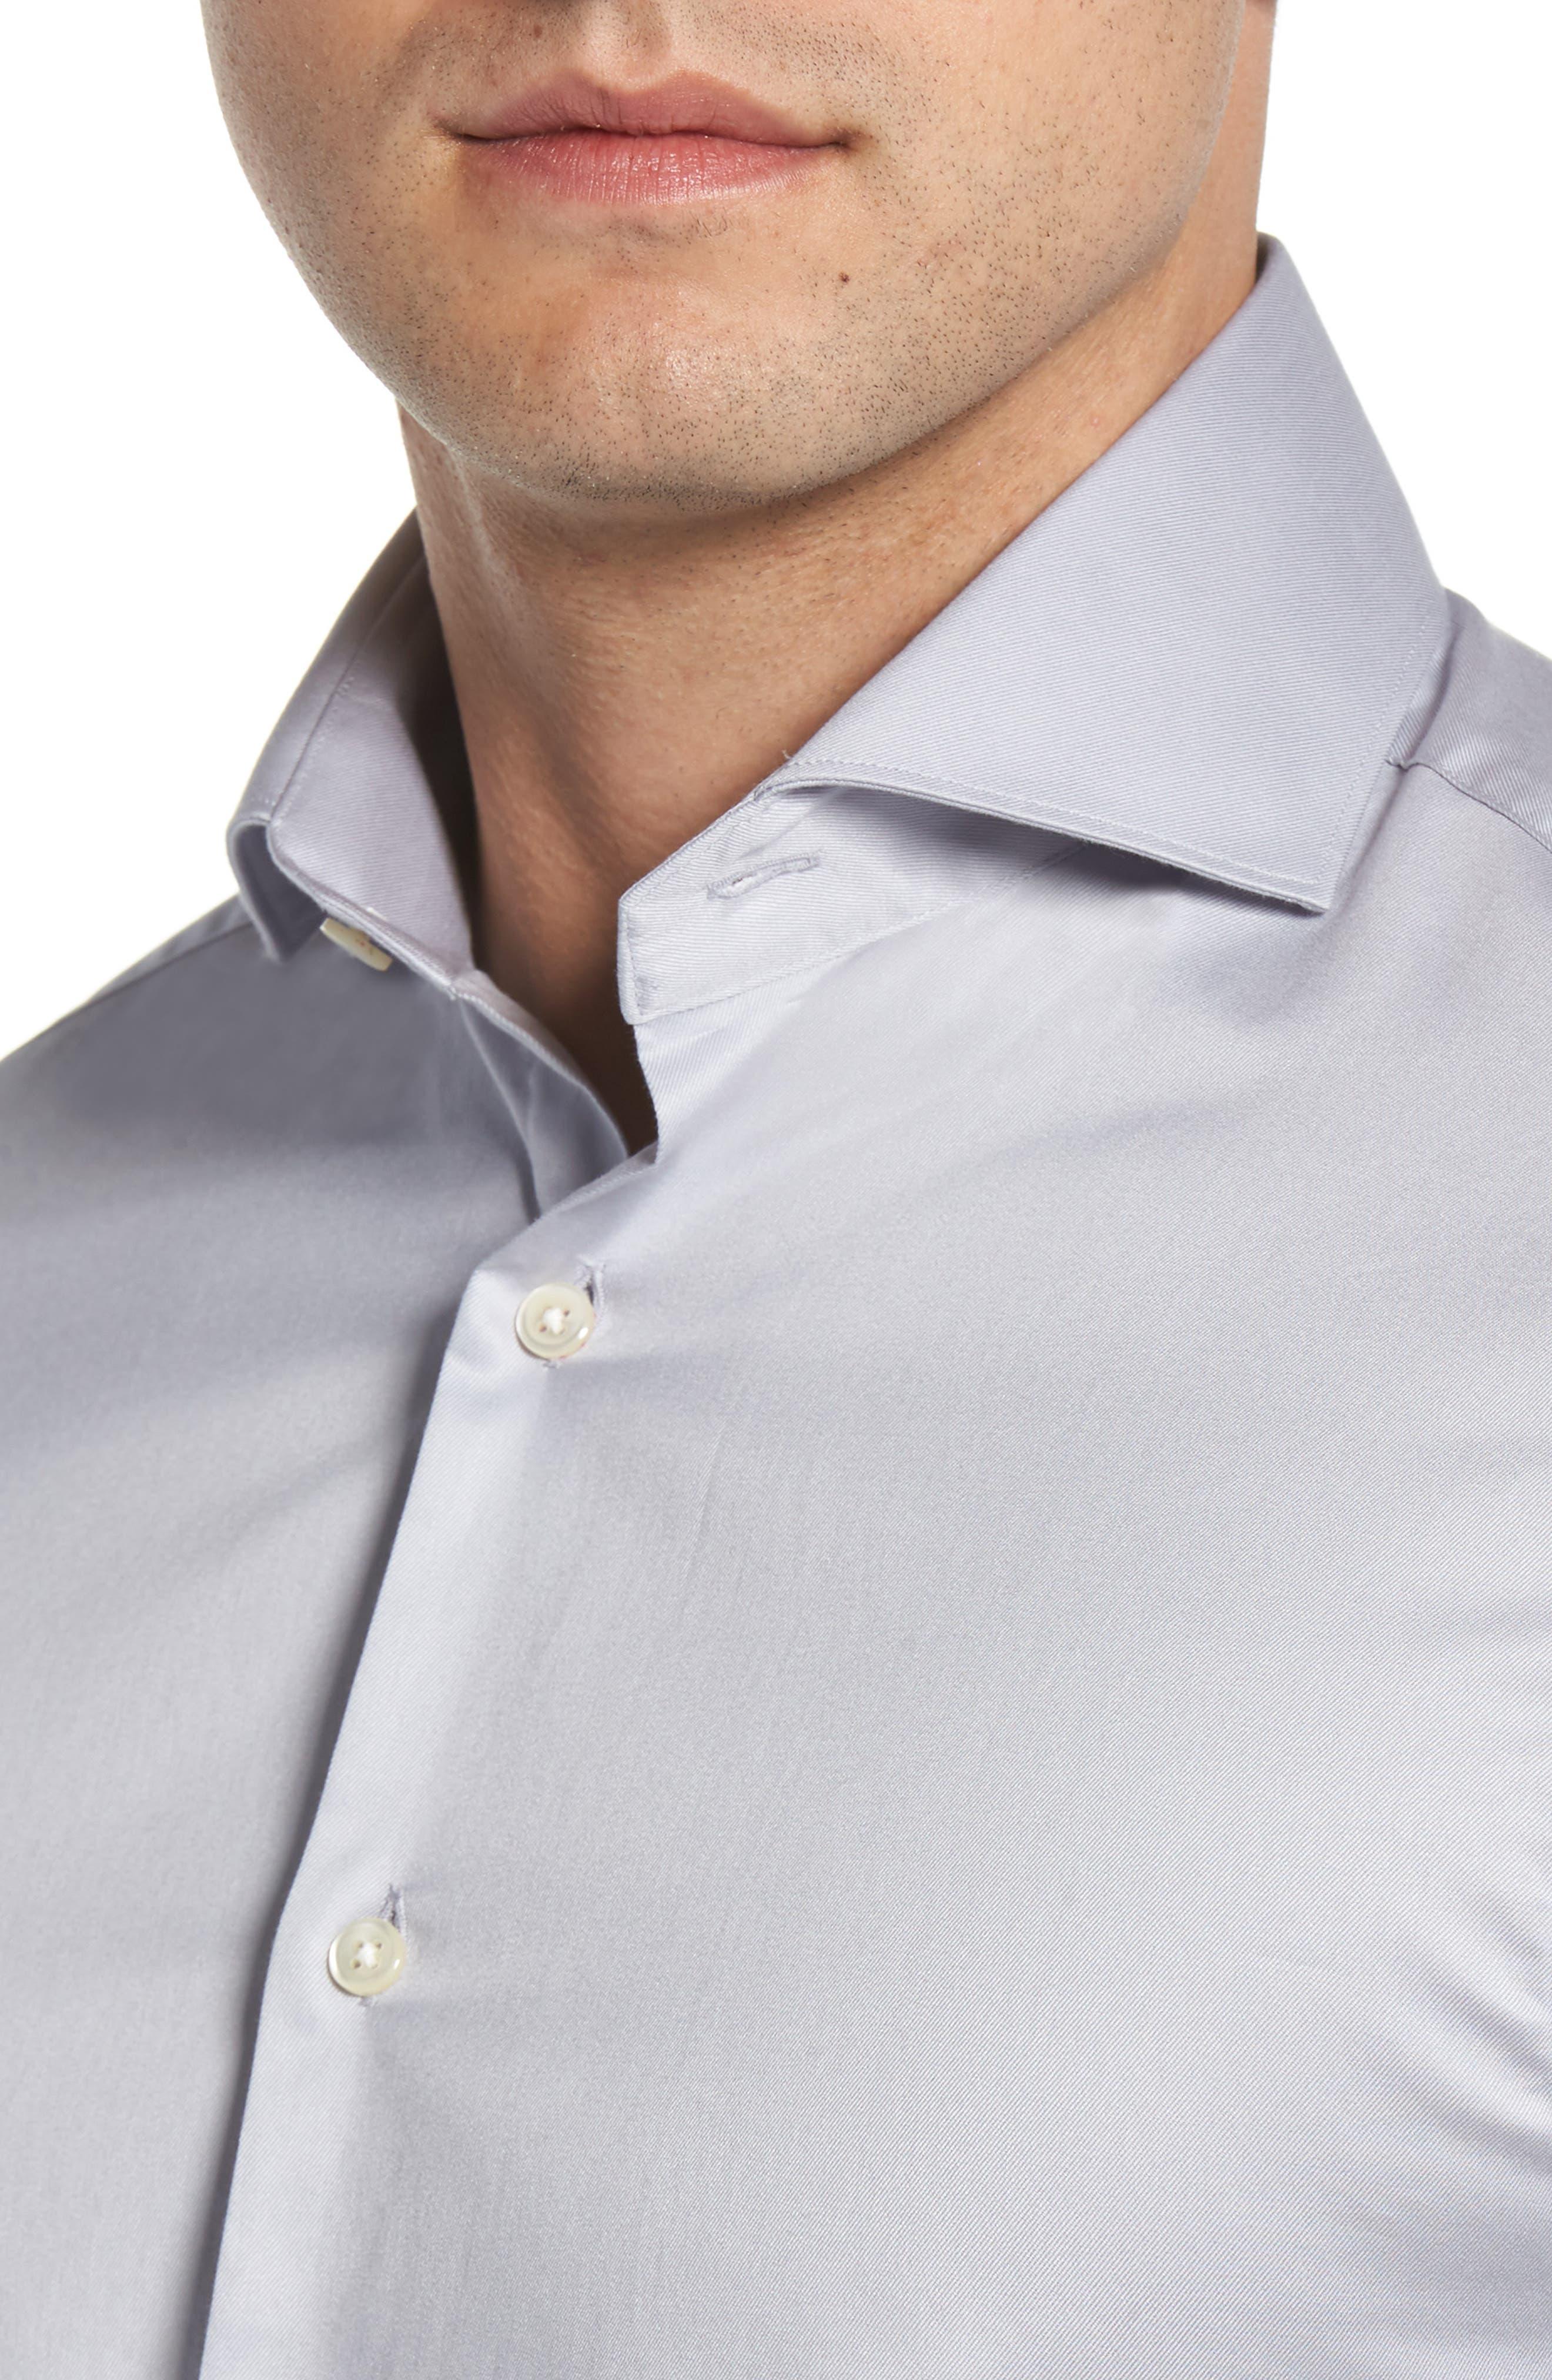 Regular Fit Solid Dress Shirt,                             Alternate thumbnail 2, color,                             020